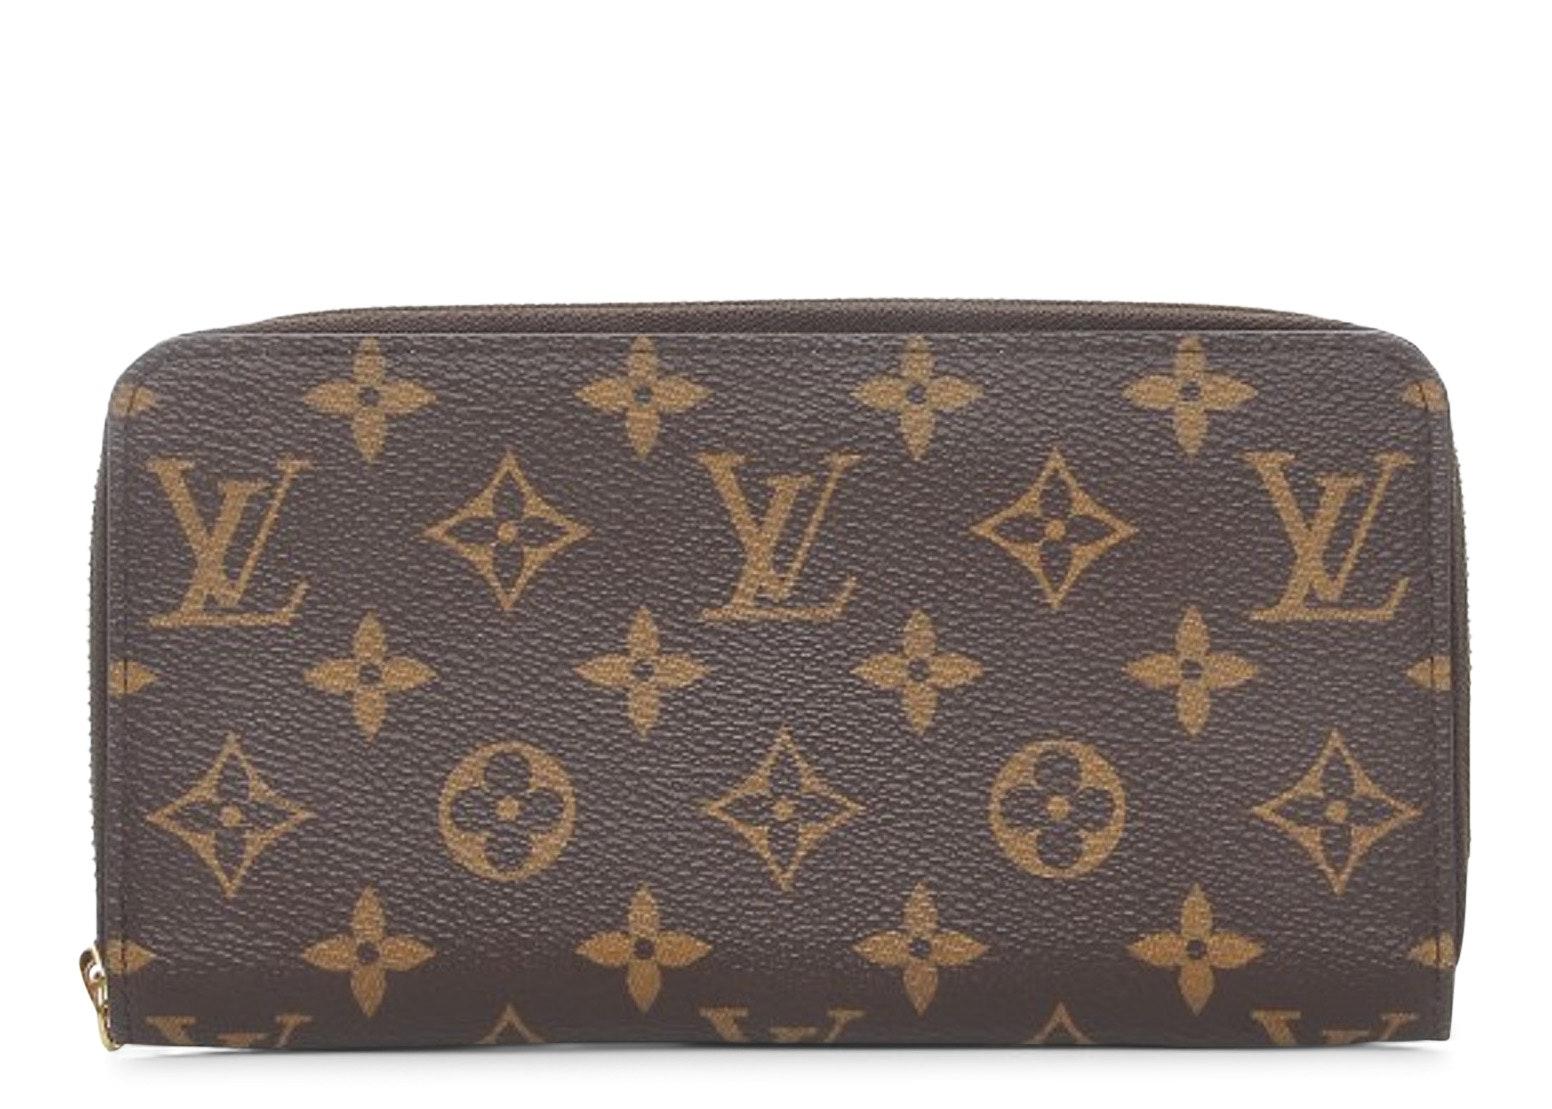 Louis Vuitton Wallet Zippy Monogram